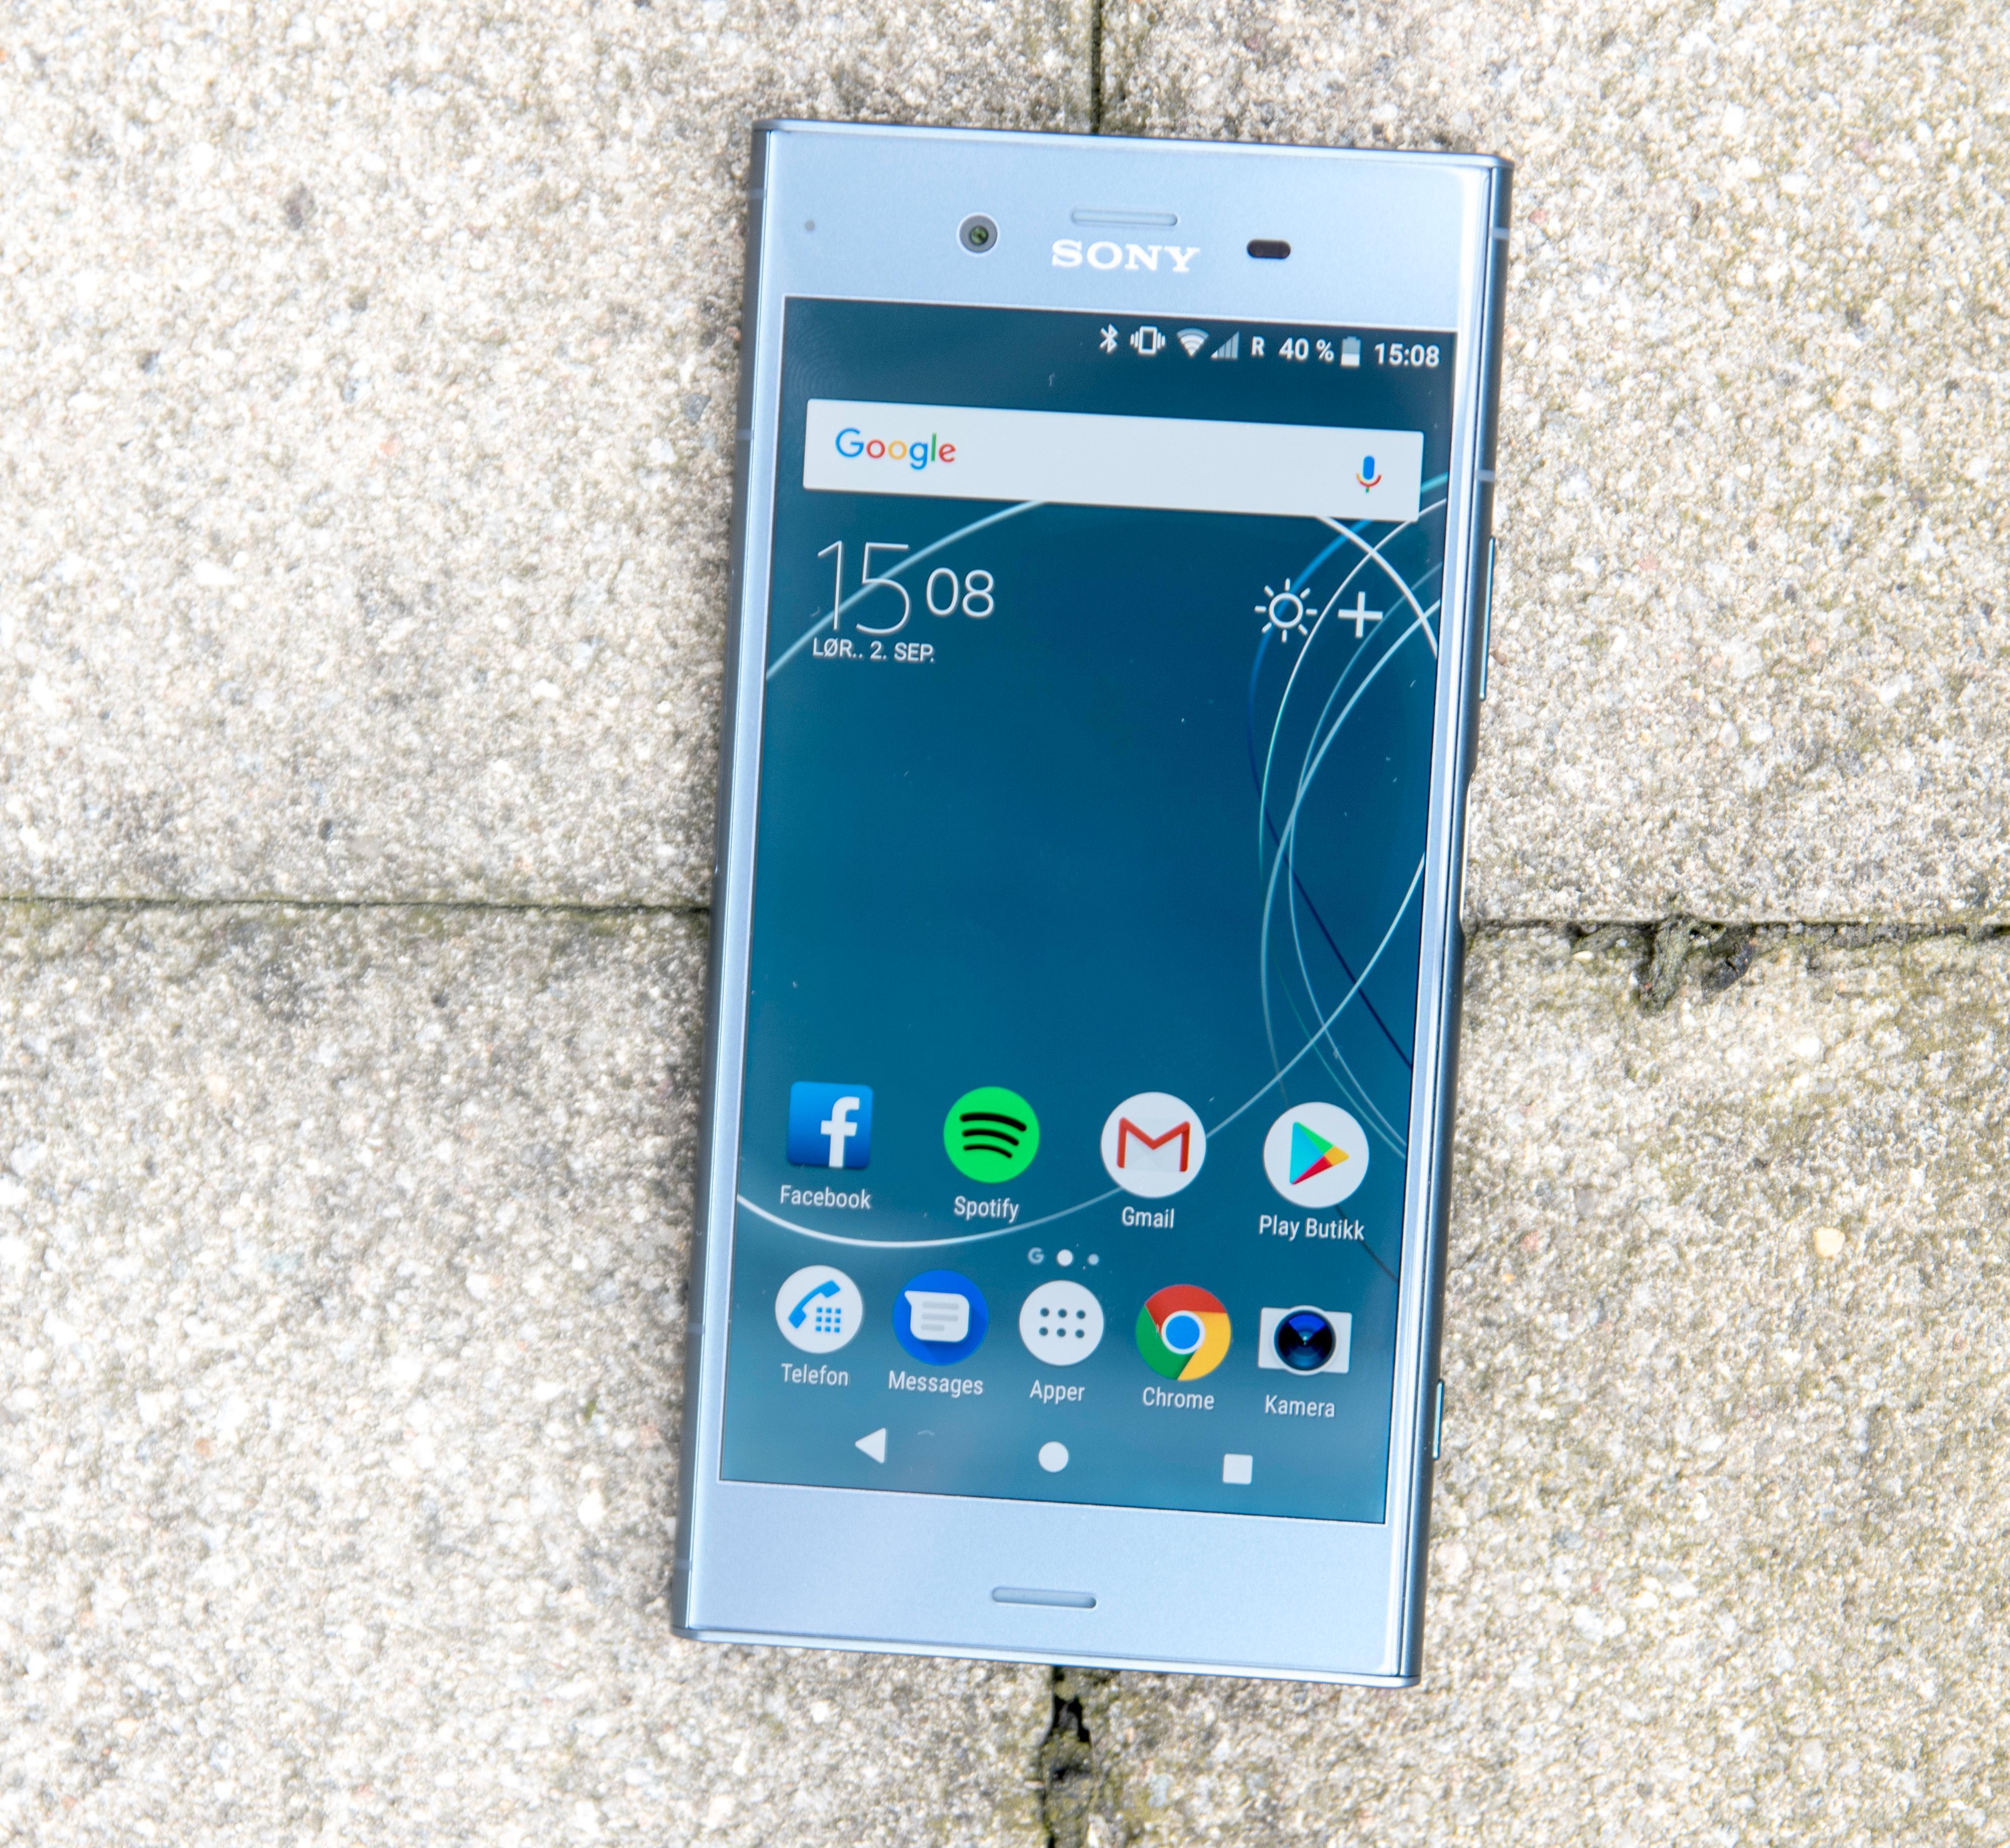 Sonys Xperia XZ1 var antakeligvis den første mobilen i norske butikker som ble levert med Android 8. Den kom i salg i oktober i fjor. Bilde: Finn Jarle Kvalheim, Tek.no